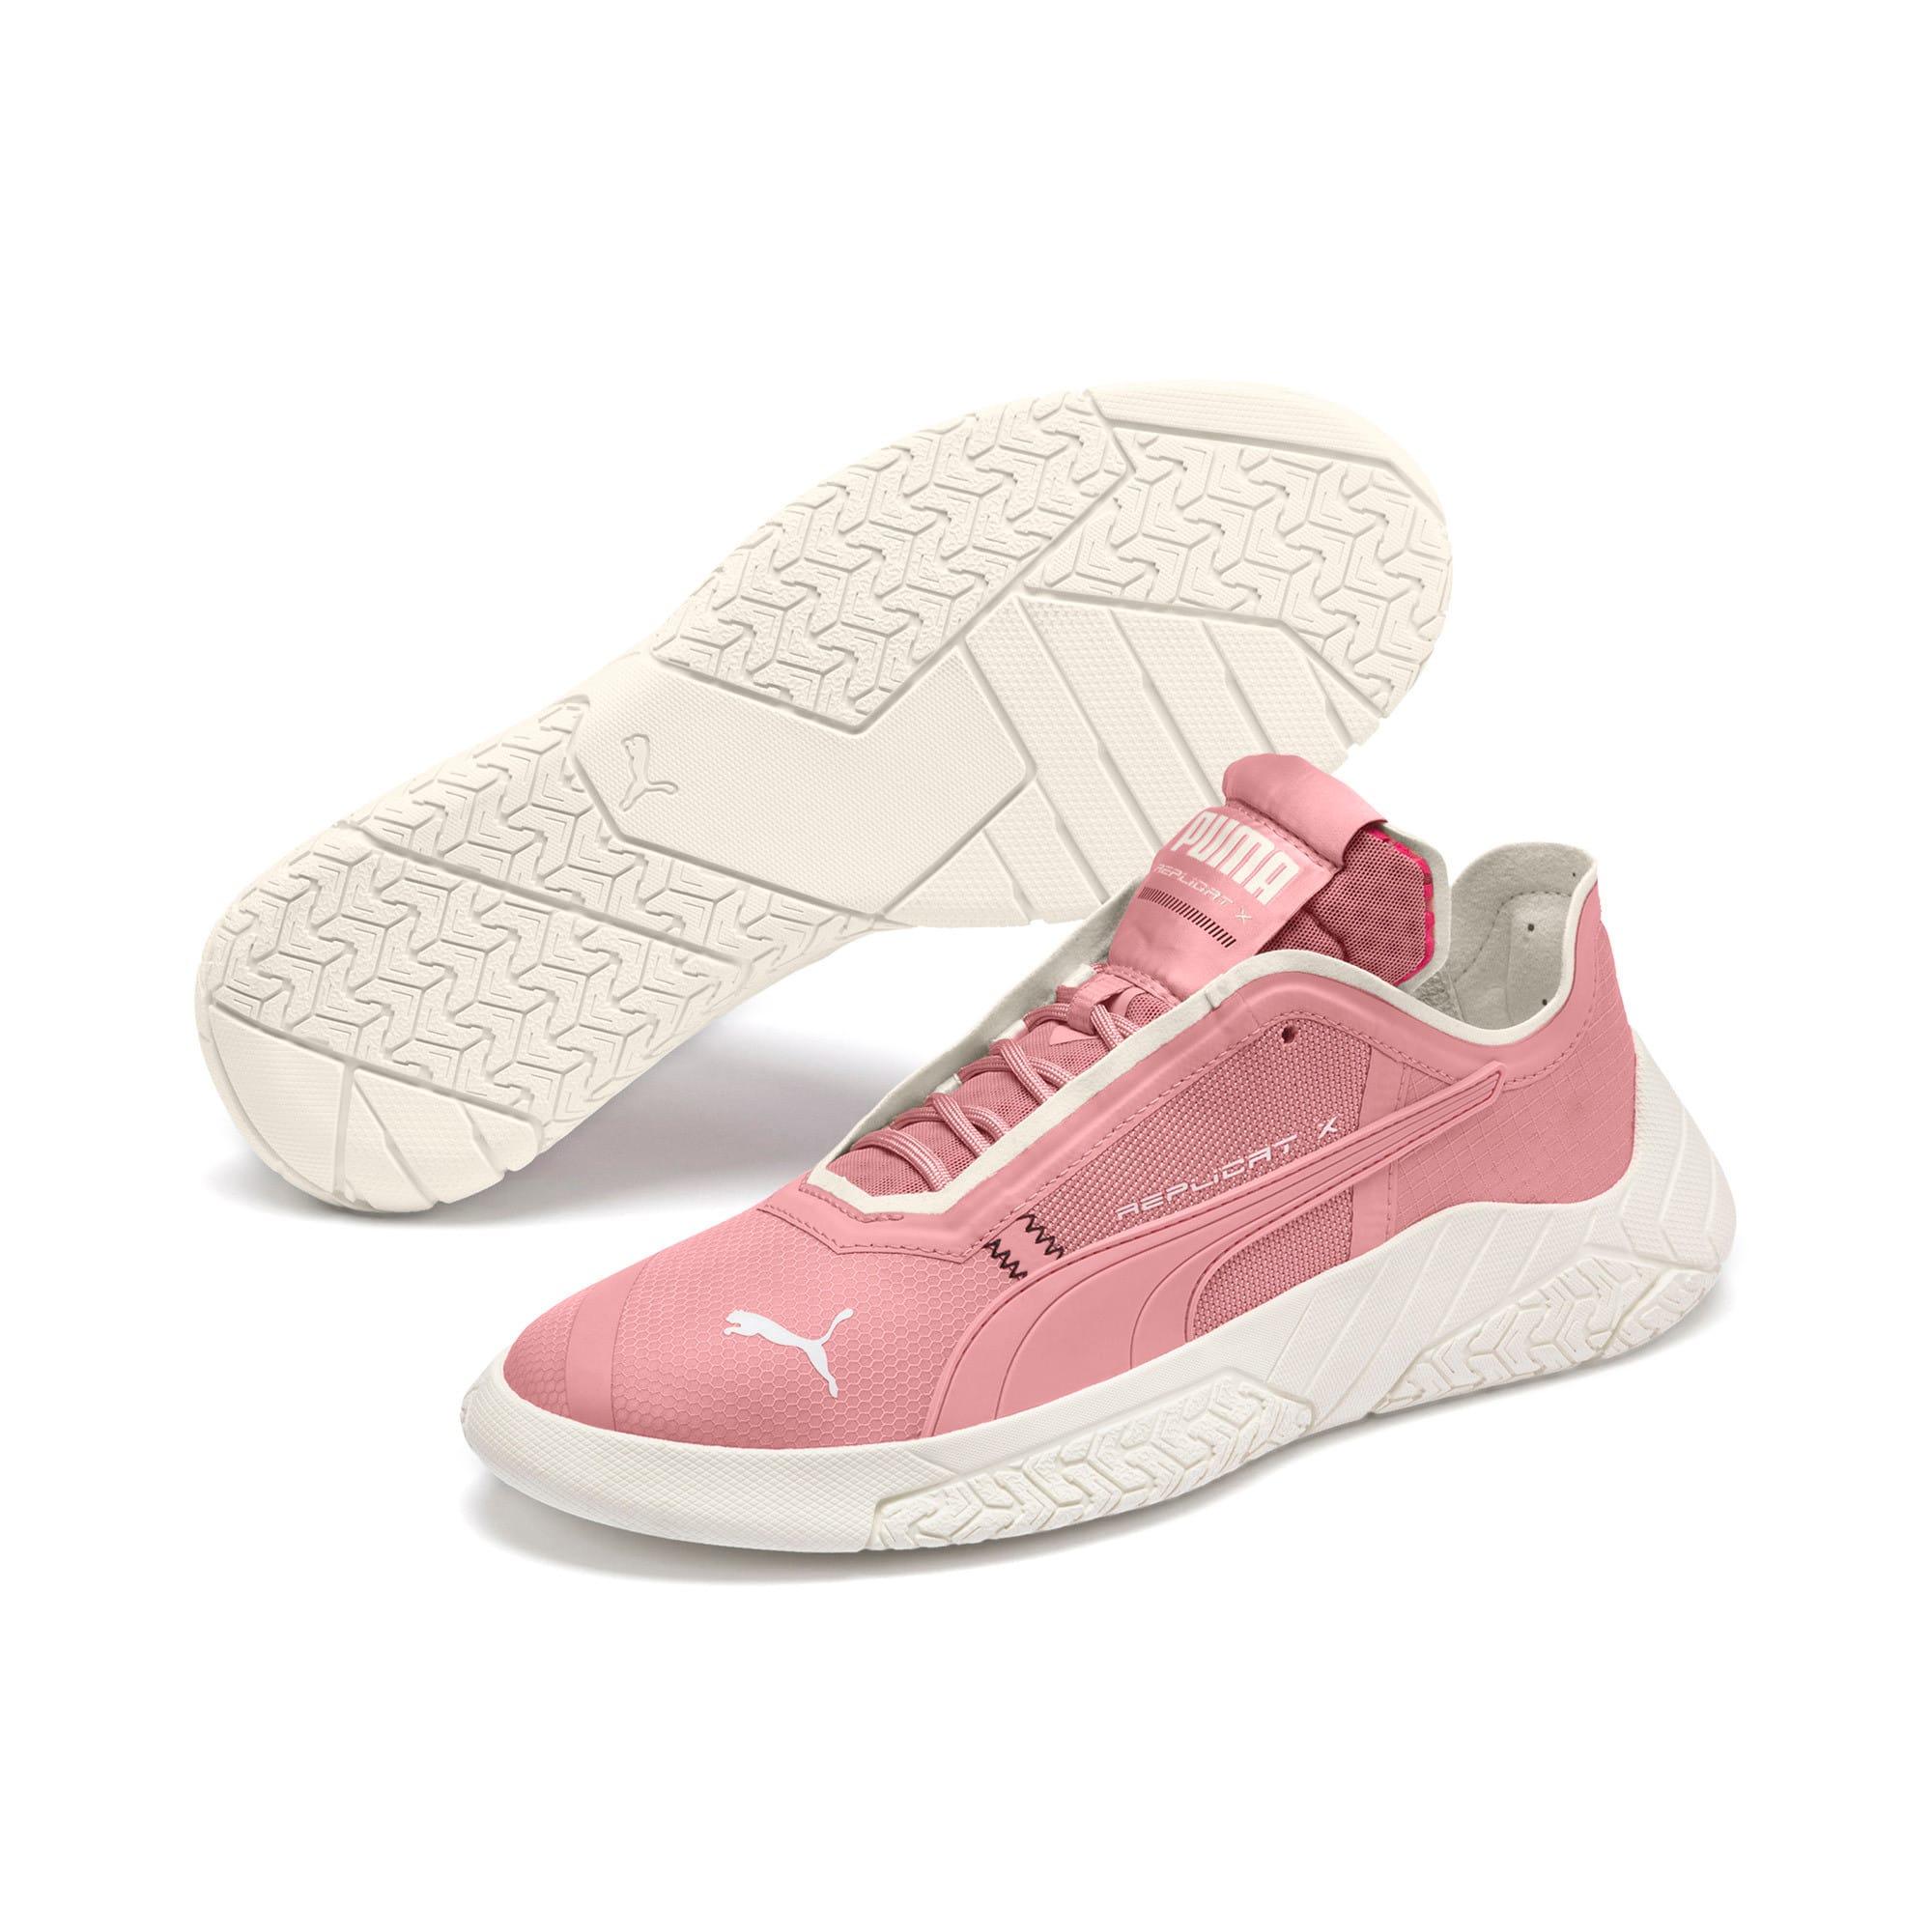 Thumbnail 2 of Replicat-X Circuit Motorsport Shoes, Bridal Rose-Whisper White, medium